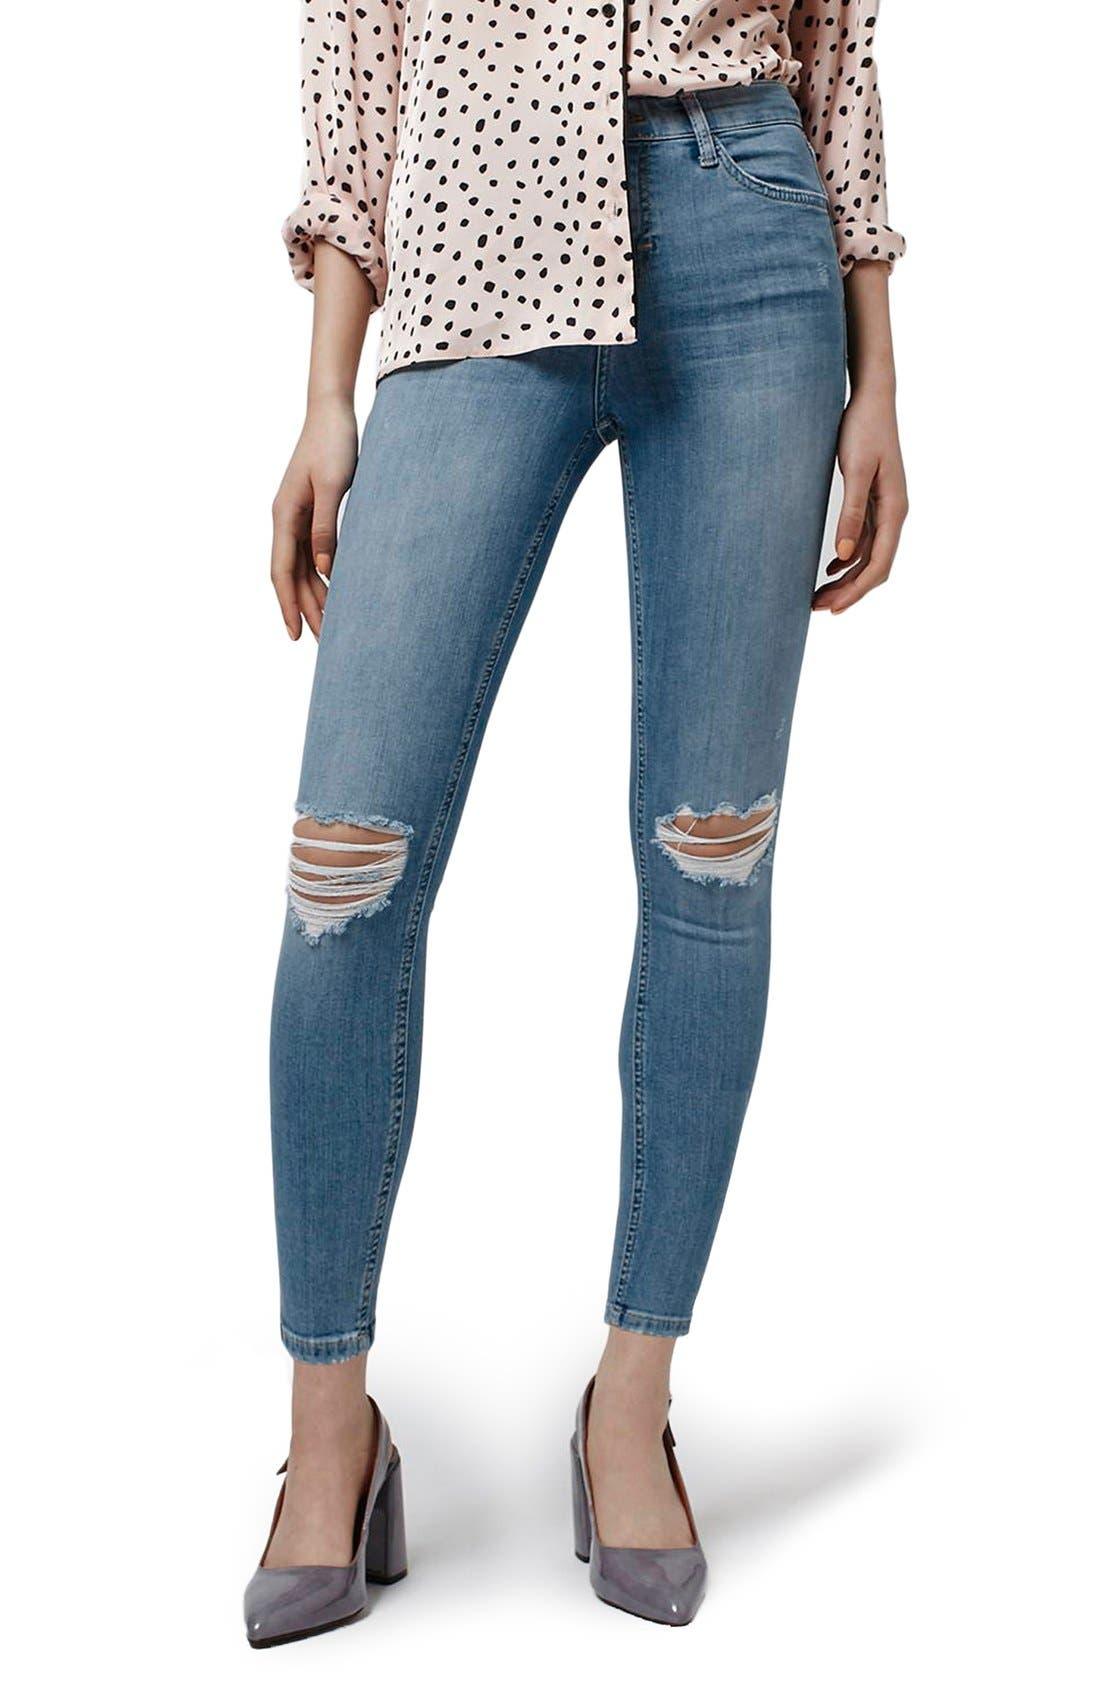 Alternate Image 1 Selected - Topshop 'Jamie' Distressed Skinny Jeans (Petite)